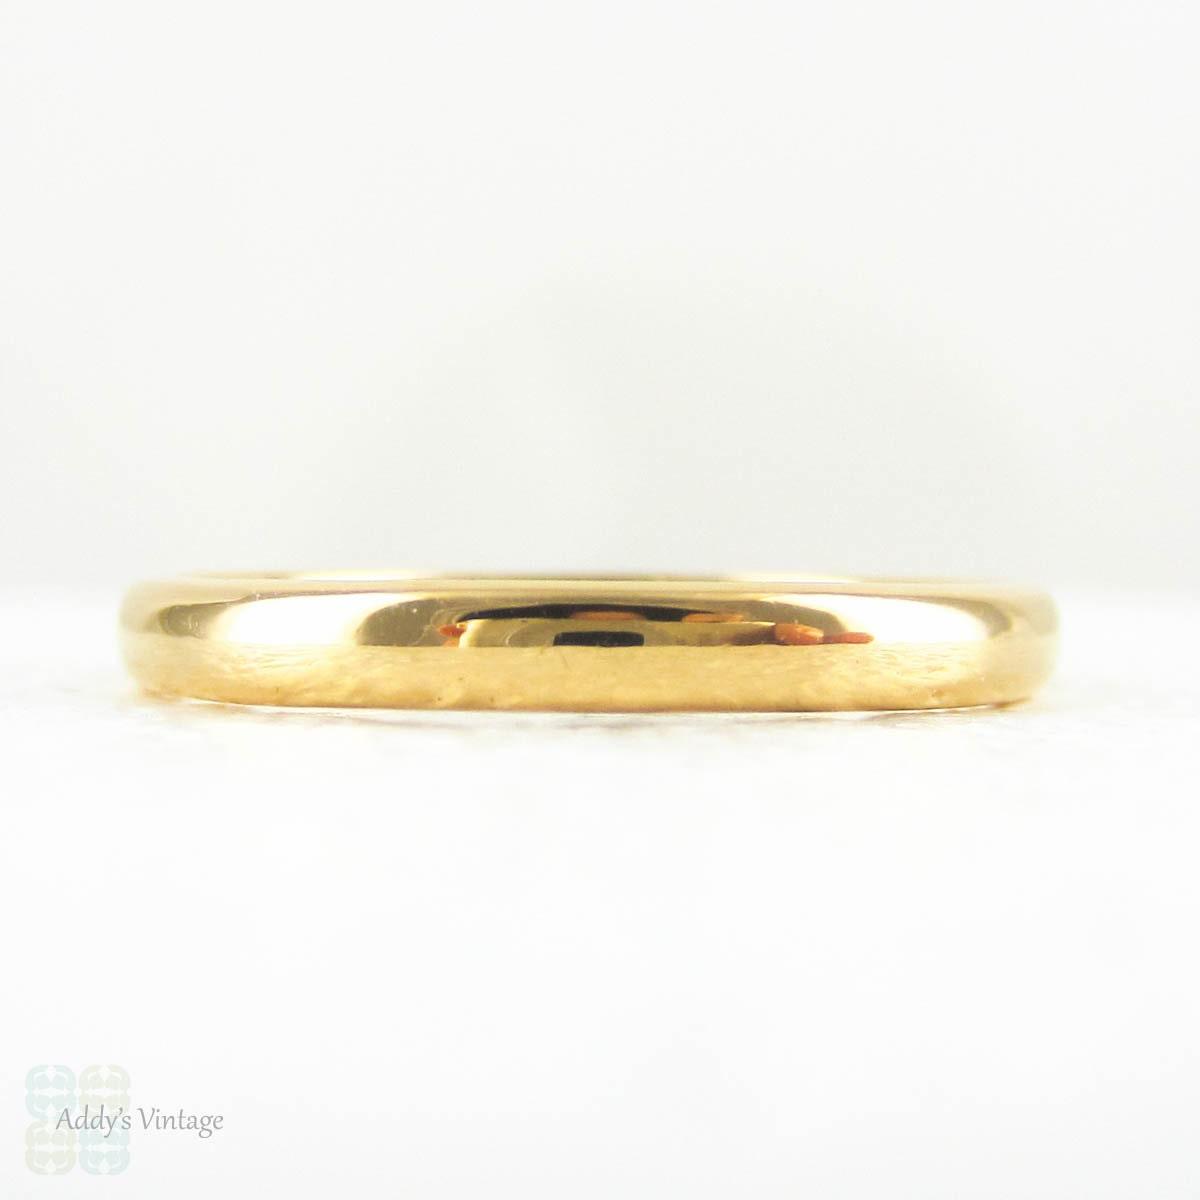 22 carat gold wedding ring simple d profile shape yellow gold